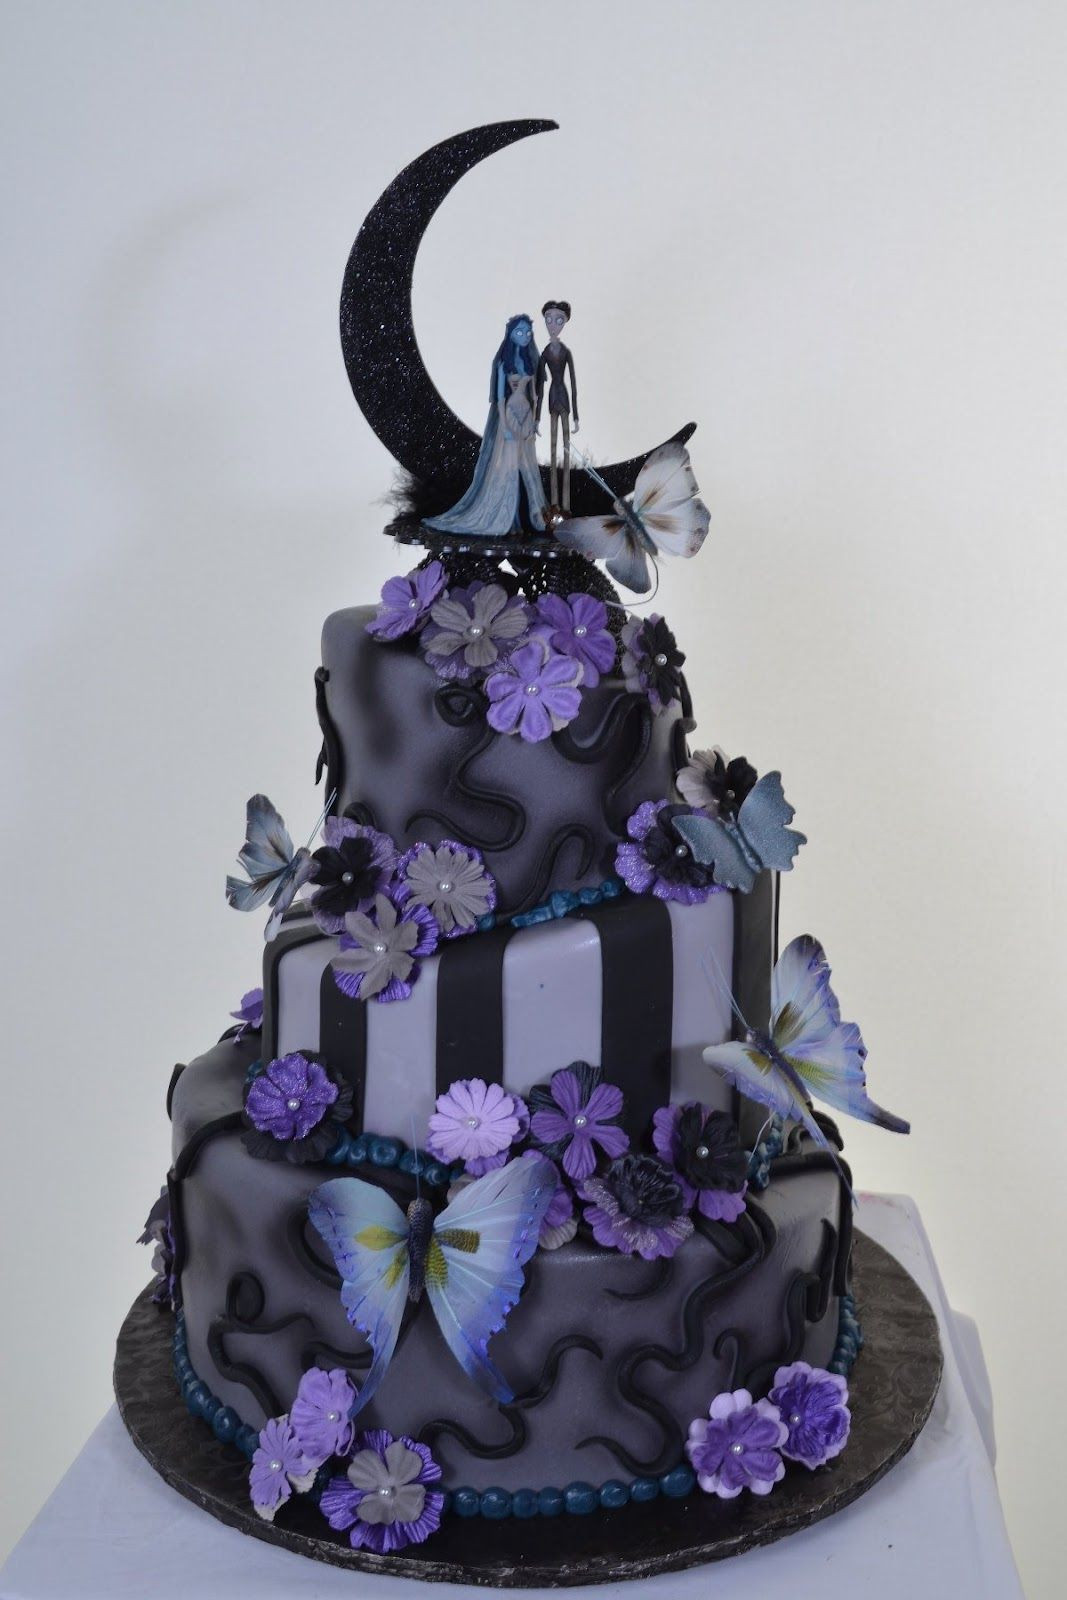 Halloween Wedding Cakes Ideas  70 Unique Halloween Wedding Cakes